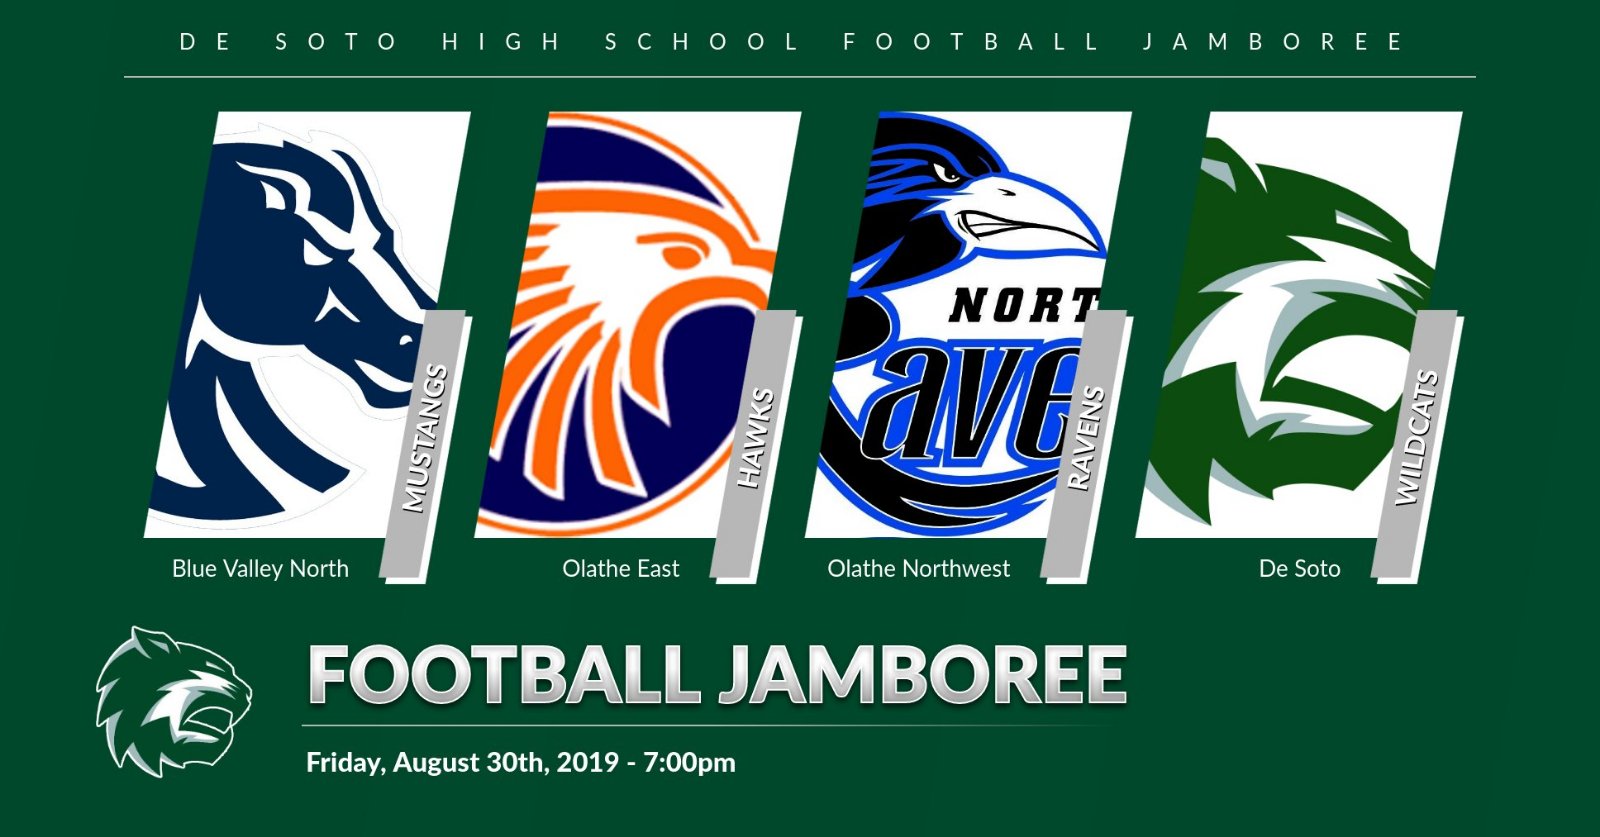 Football Jamboree